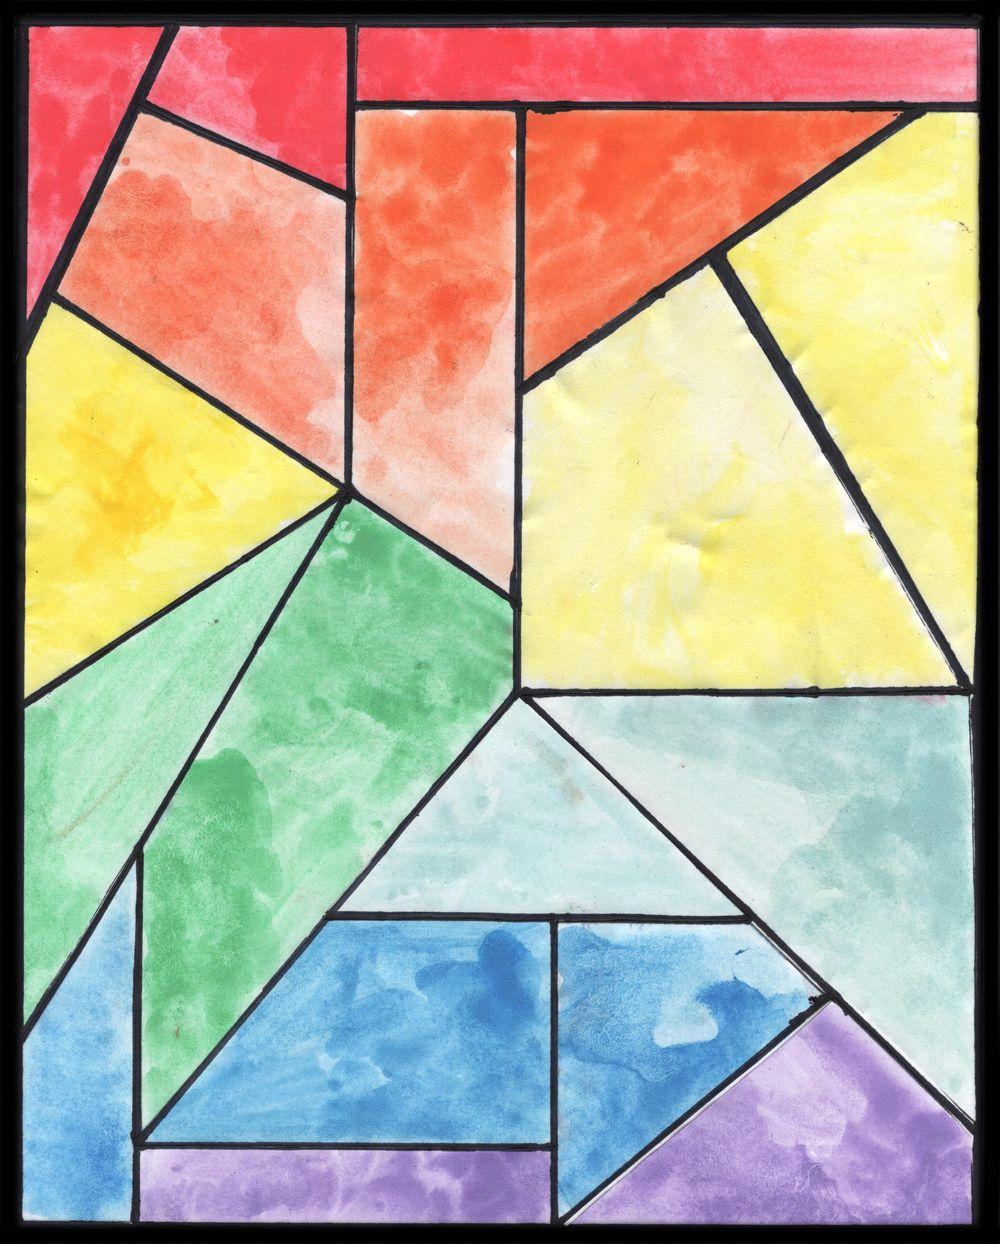 geometric rainbow - image 1 - student project